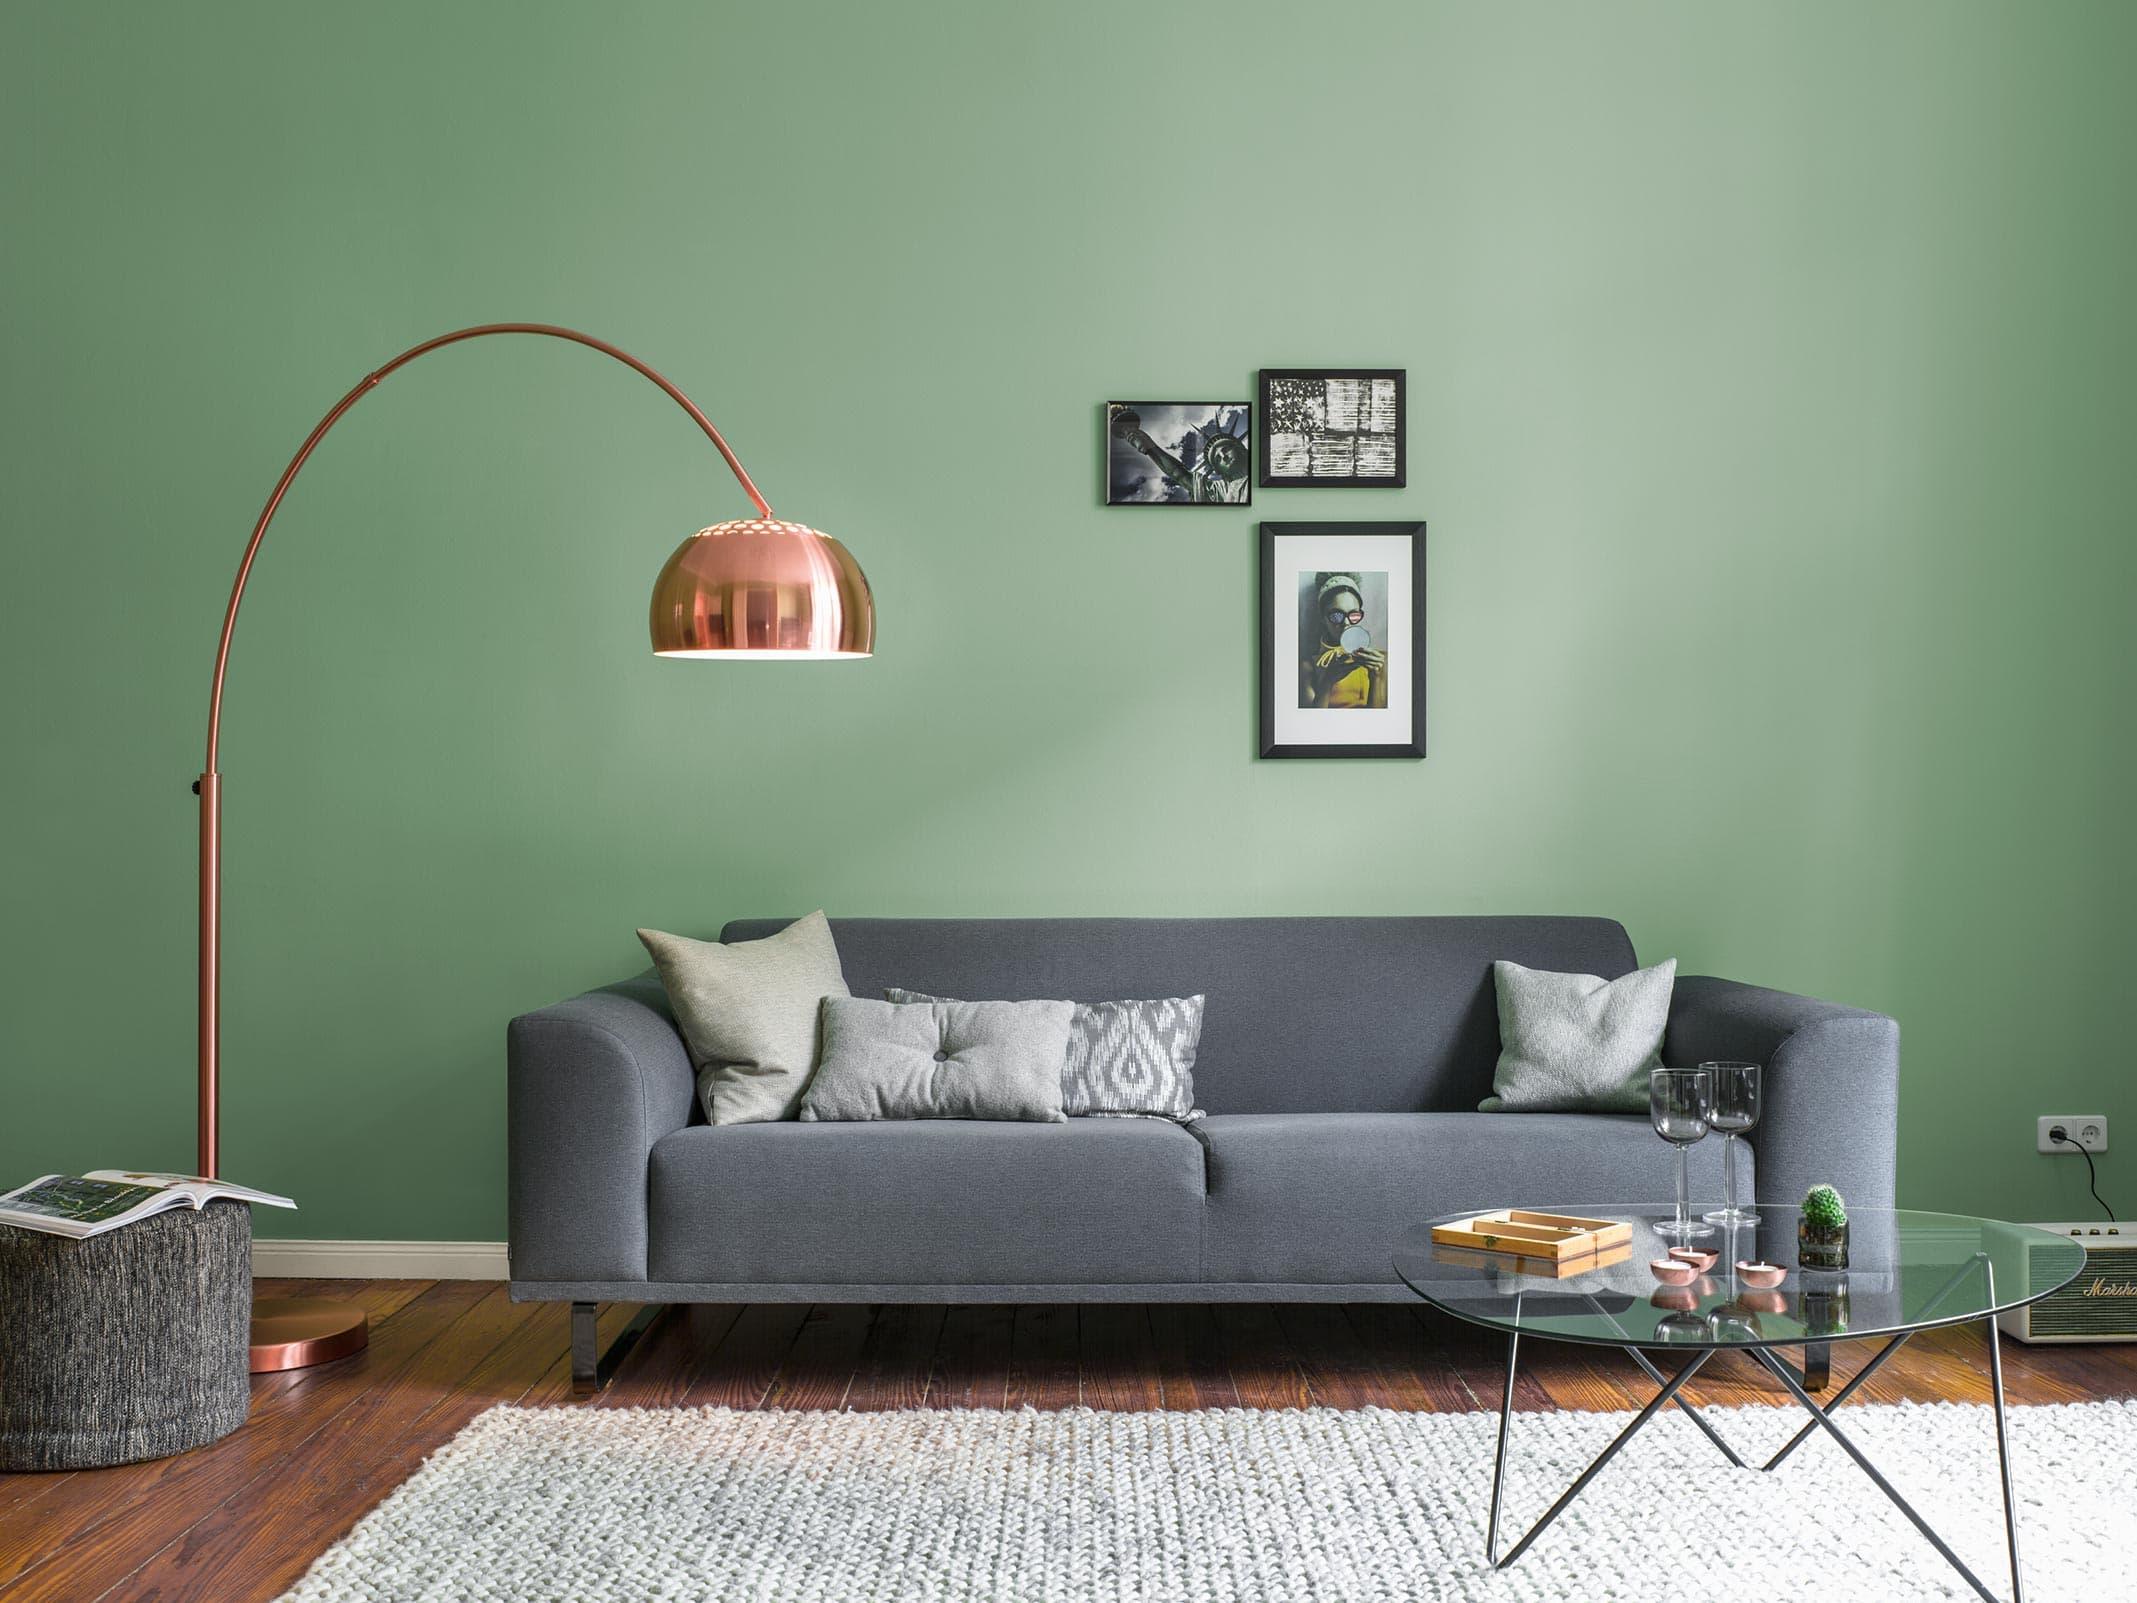 alpina feine farben edelmatte wandfarben in gr n alpina farben. Black Bedroom Furniture Sets. Home Design Ideas